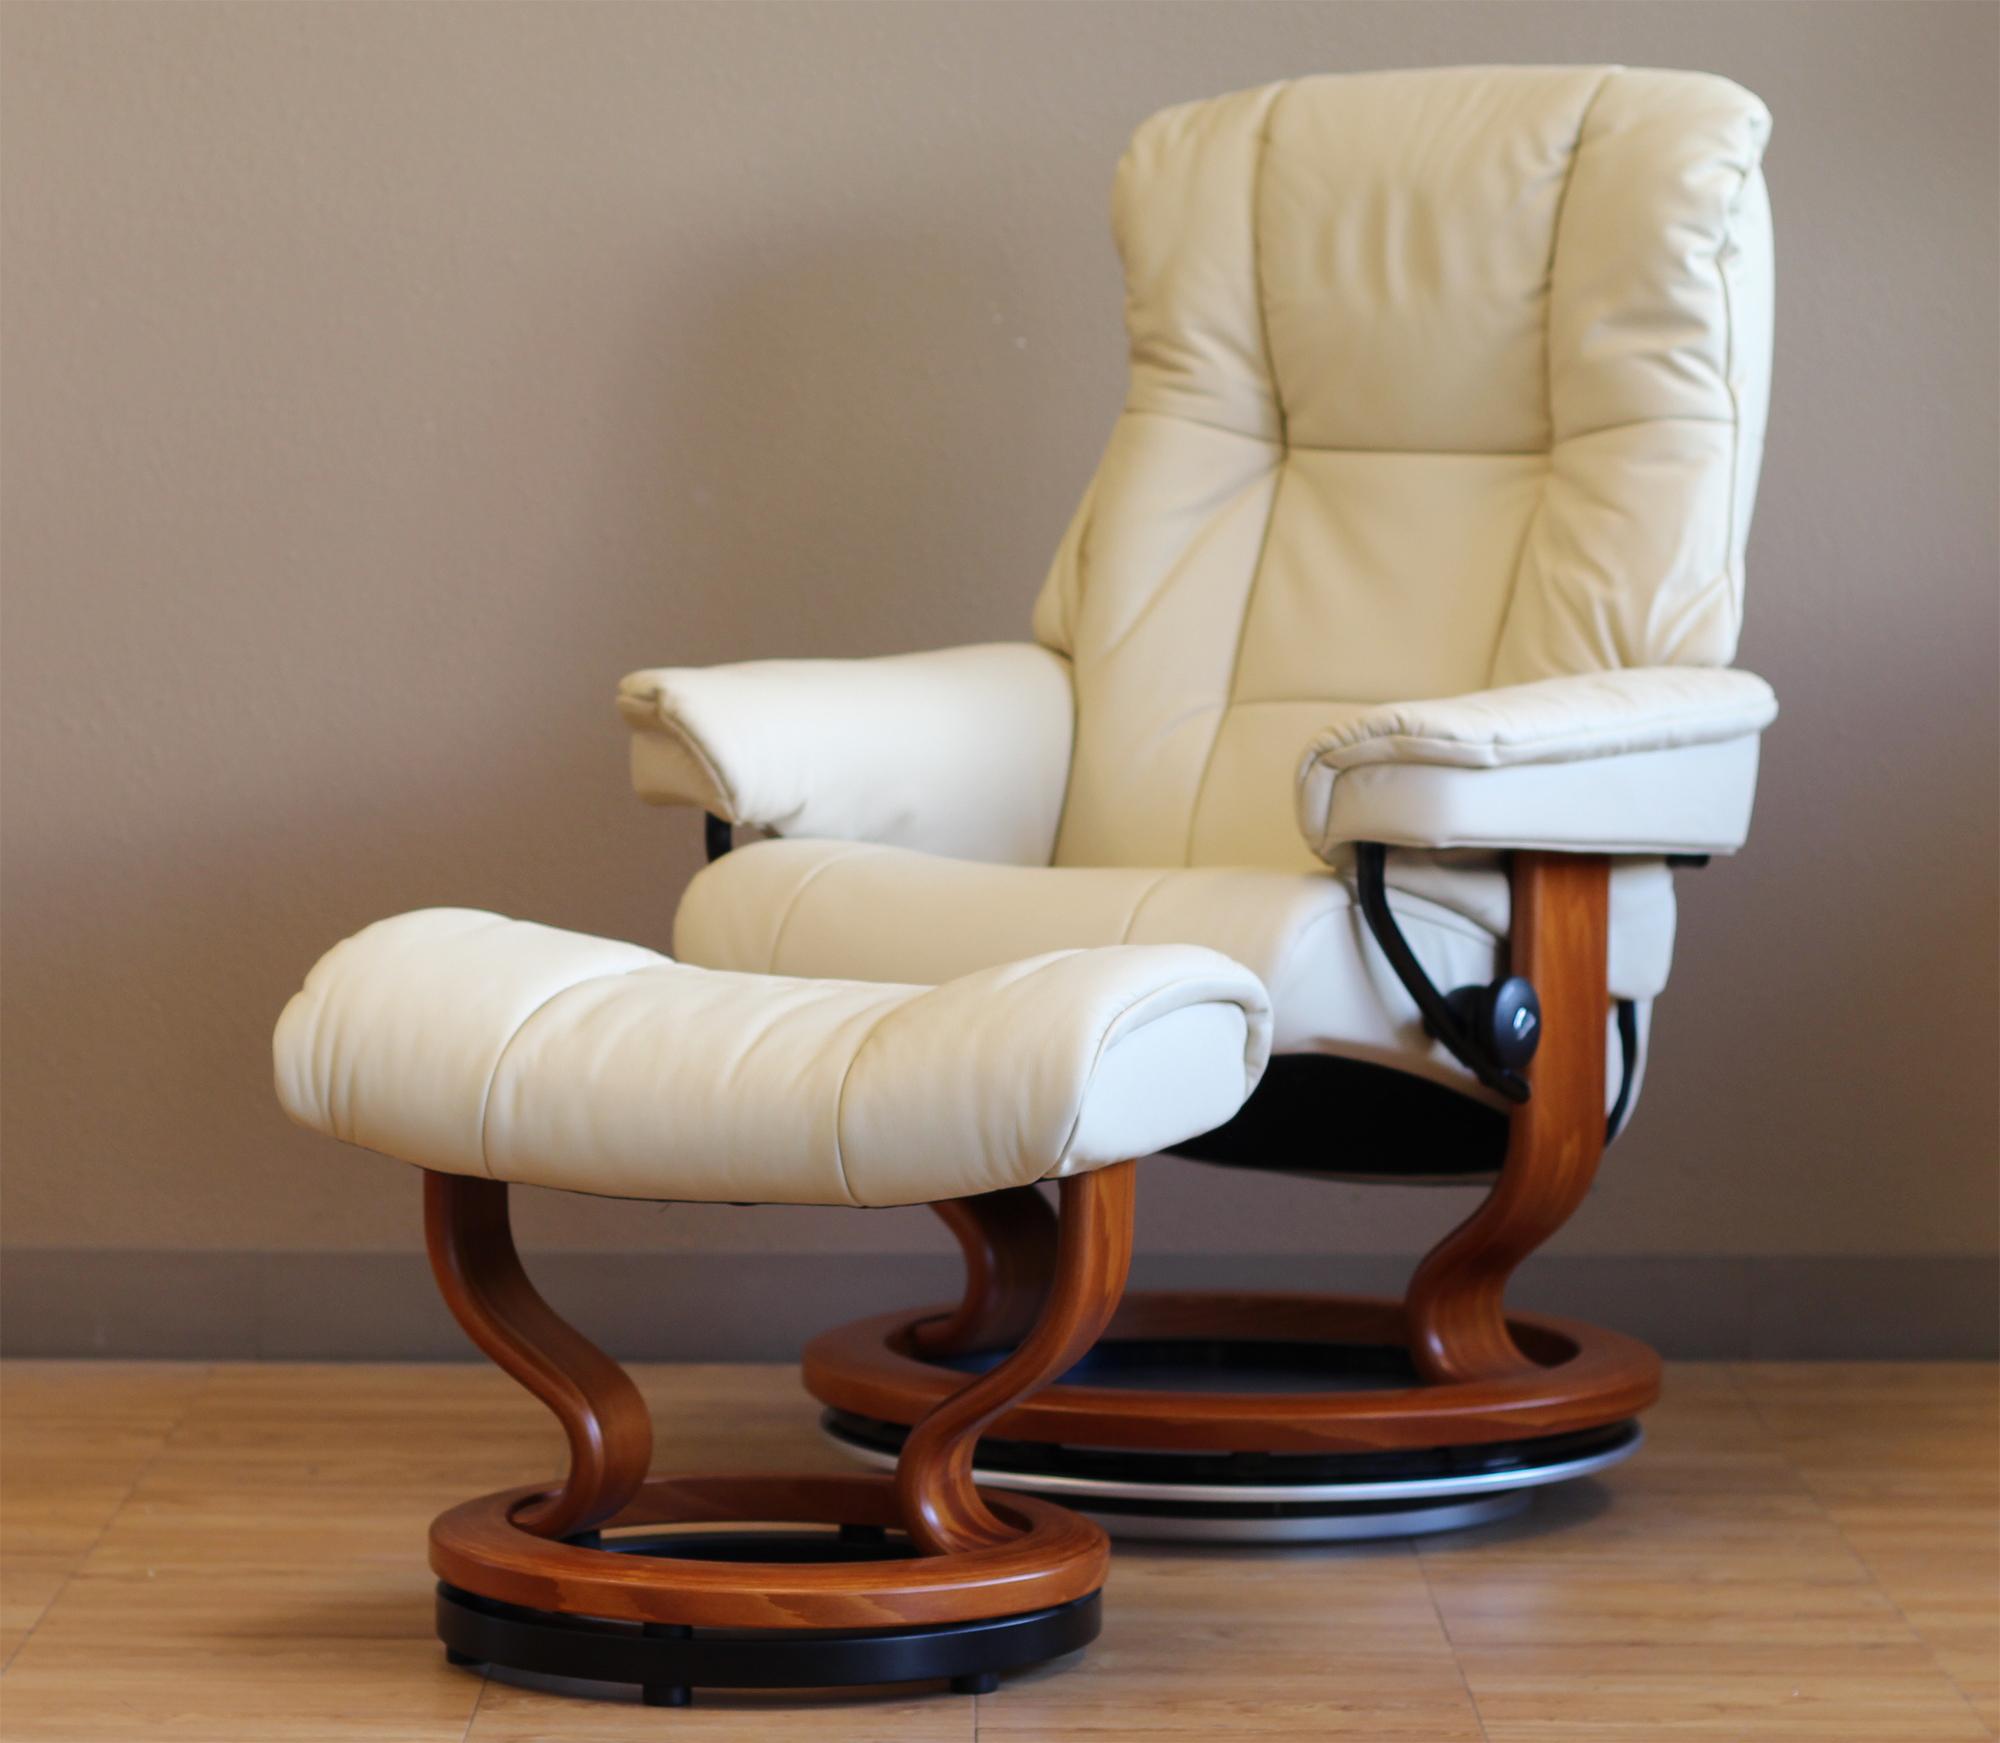 Stressless Mayfair Paloma Kitt Leather Recliner Chair By